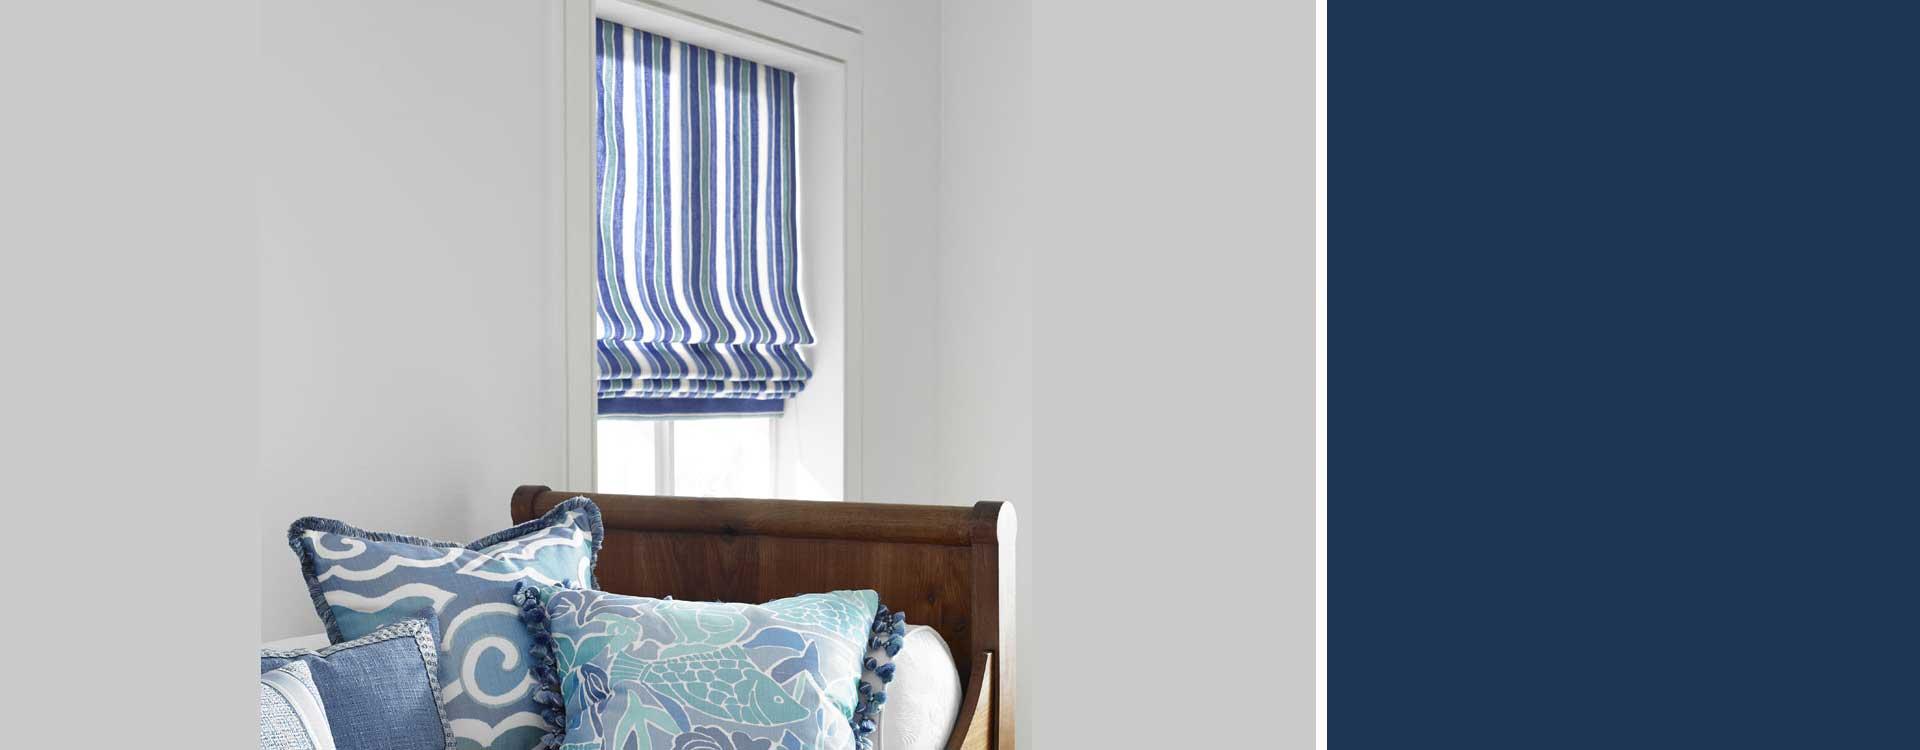 custom sheer drapes online valances roman shades direct regal drapes. Black Bedroom Furniture Sets. Home Design Ideas